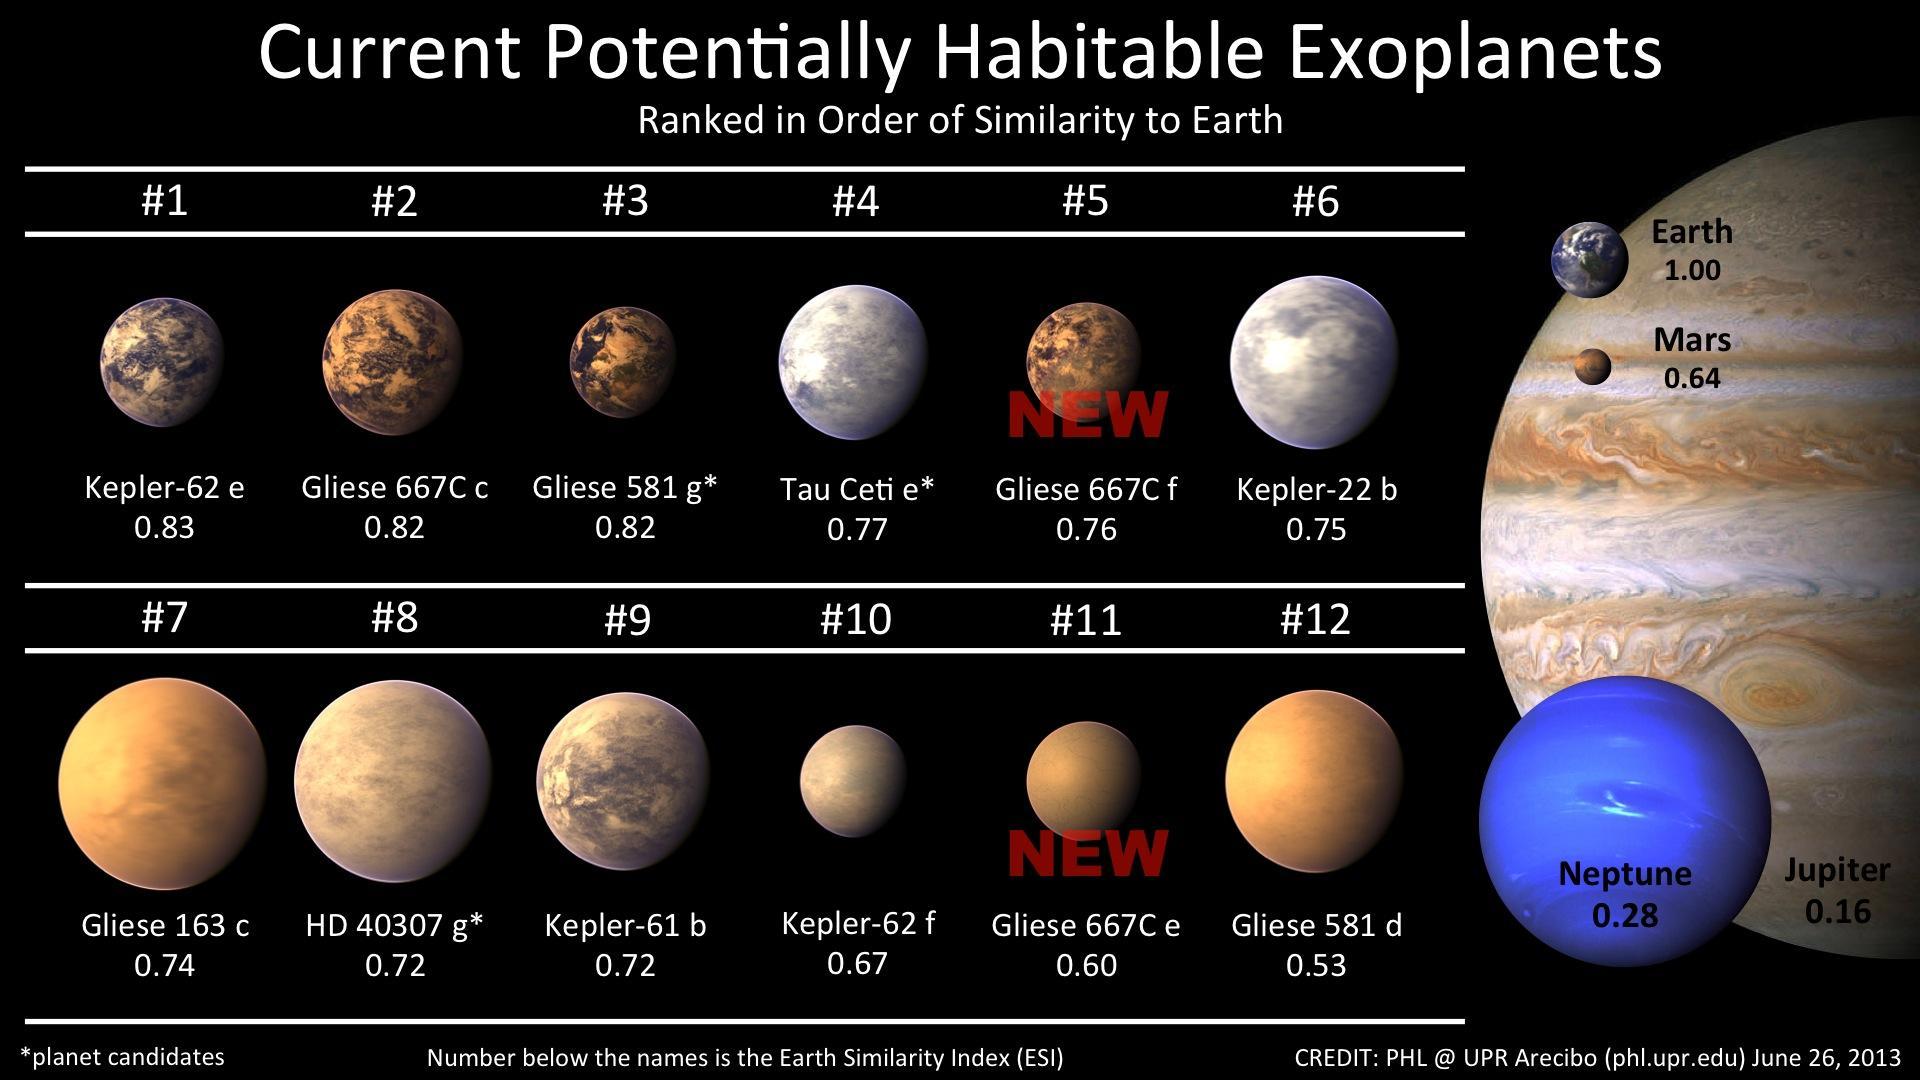 planets gliese 667 - photo #19